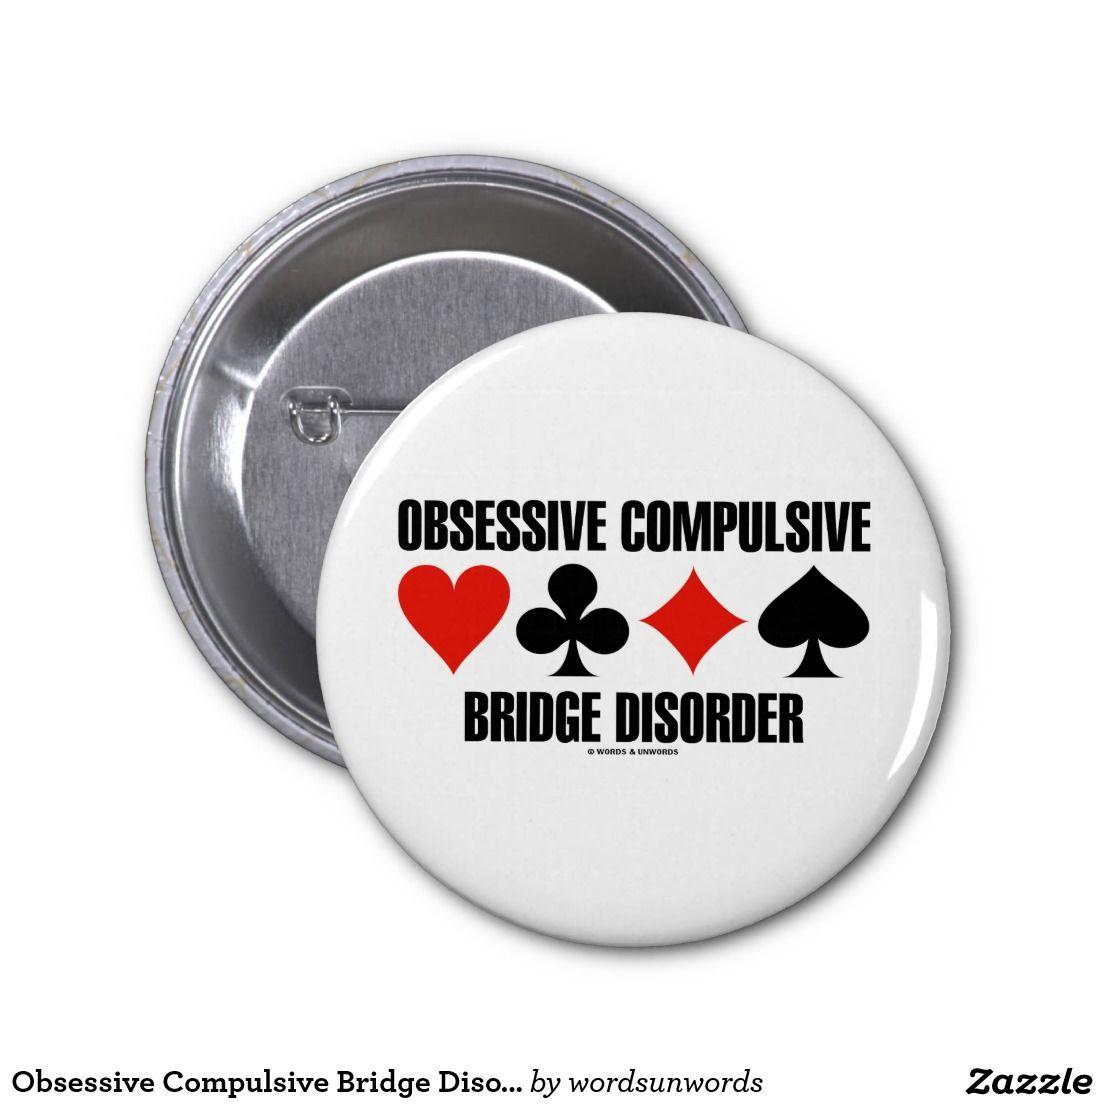 "Obsessive Compulsive Bridge Disorder (OCBD) 2 Inch Round Button #ocbd #obsessive #compulsive #bridge #disorder #geek #humor #duplicatebridge #acbl #funny #cardsuits #bridgegame #fourcardsuits #wordsandunwords Here's a pinback button for any bride player who has OCBD -- i.e., ""Obsessive Compulsive Bridge Disorder""."